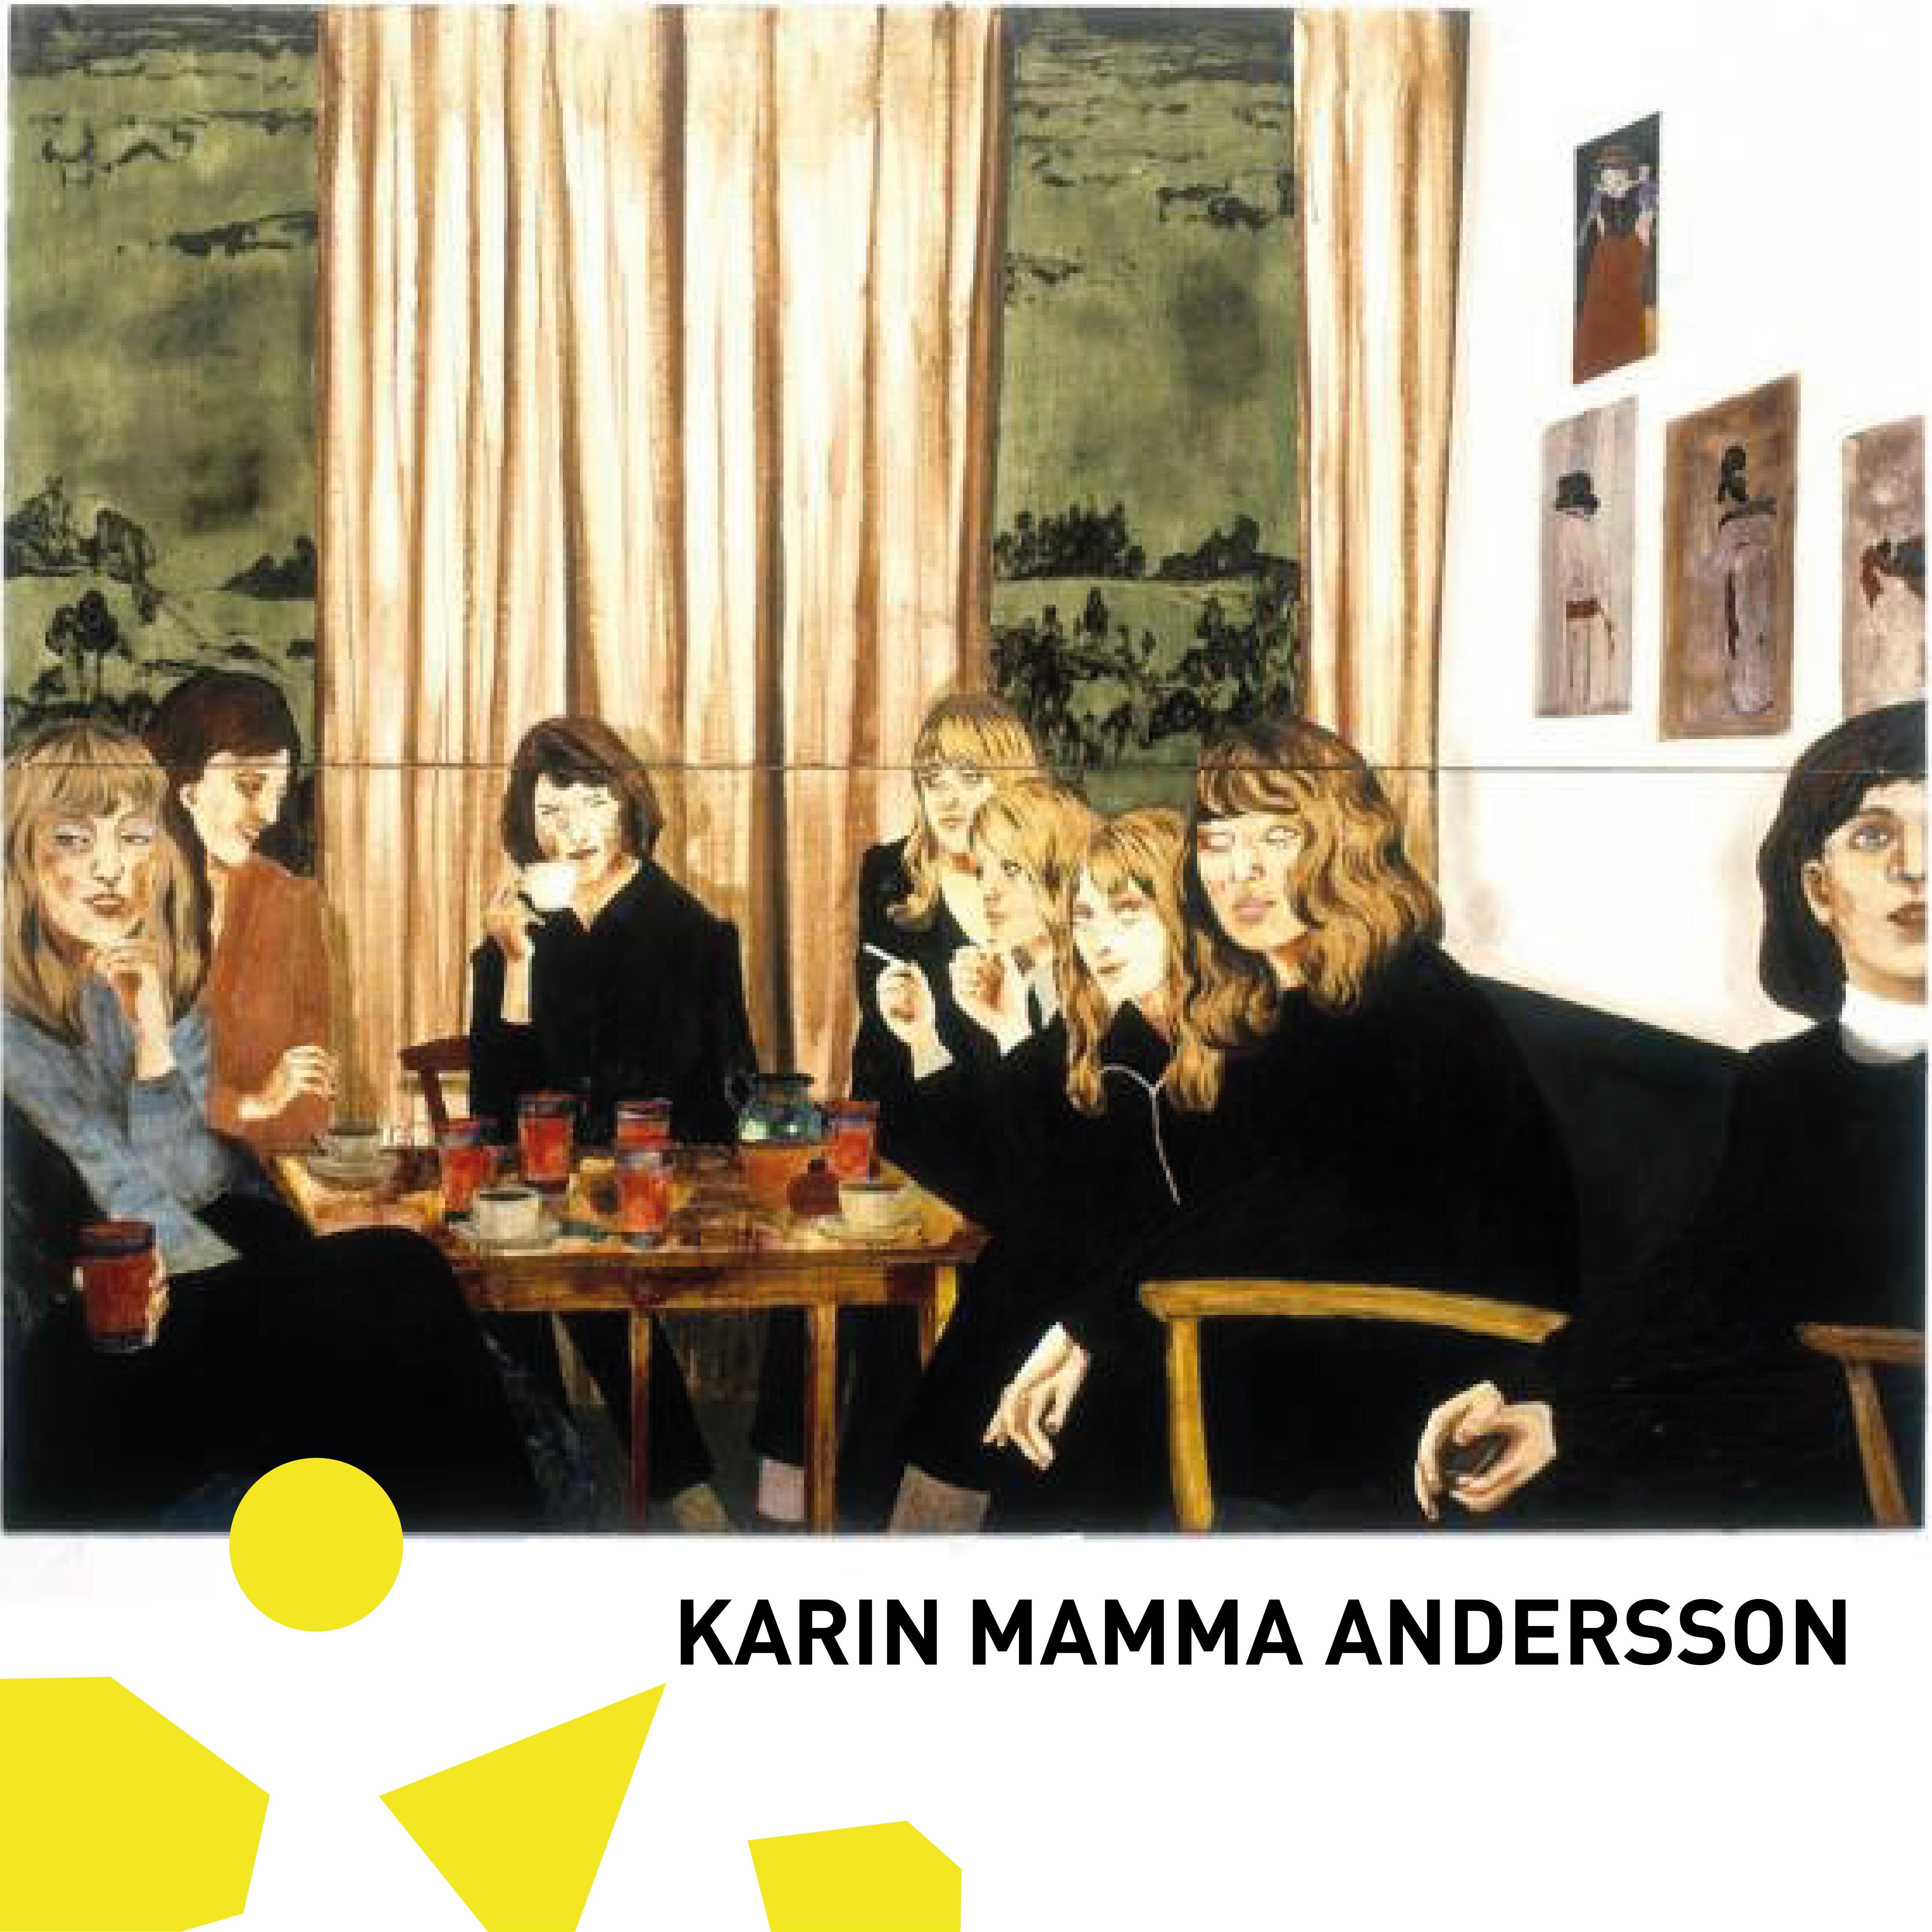 Karin Mamma Andersson